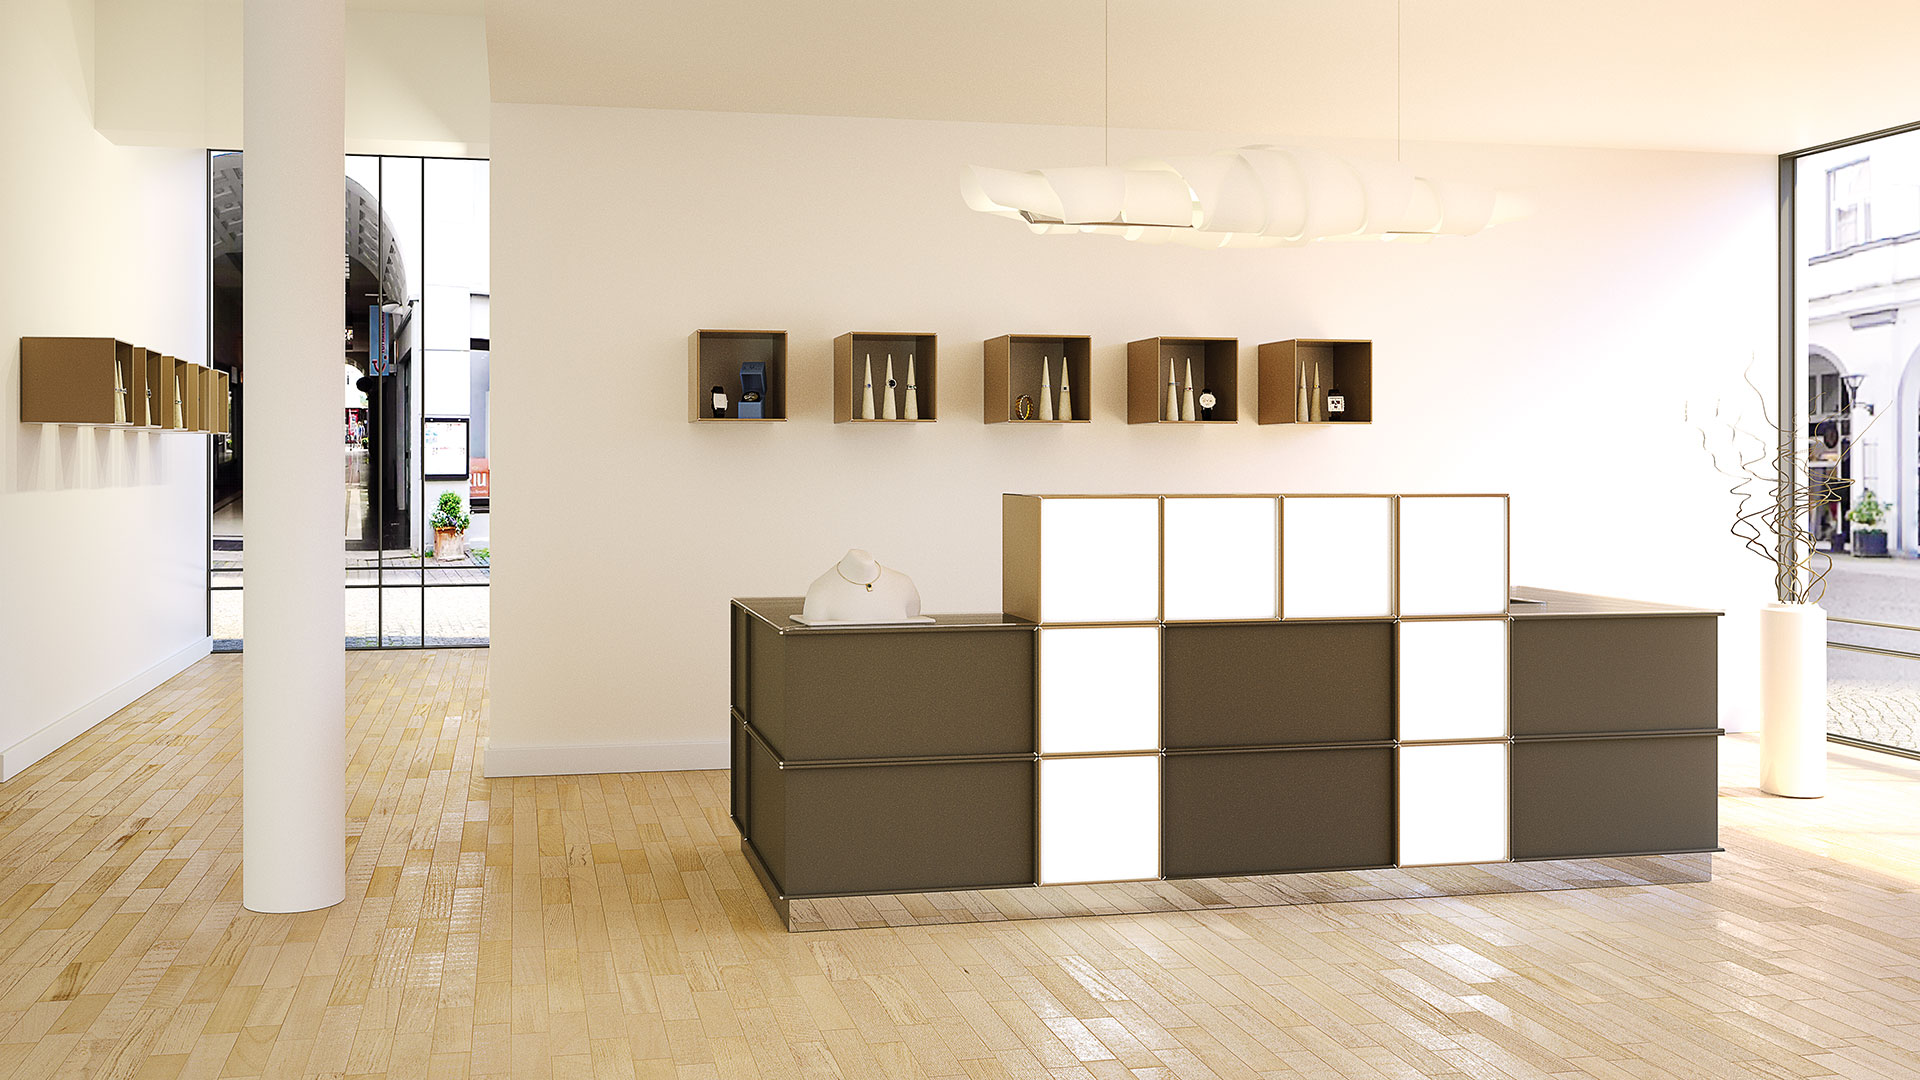 Design-Moebel-Stauraum-Thekenelement-Verkaufstresen-element-x-16-9CGRP91dshvHQT